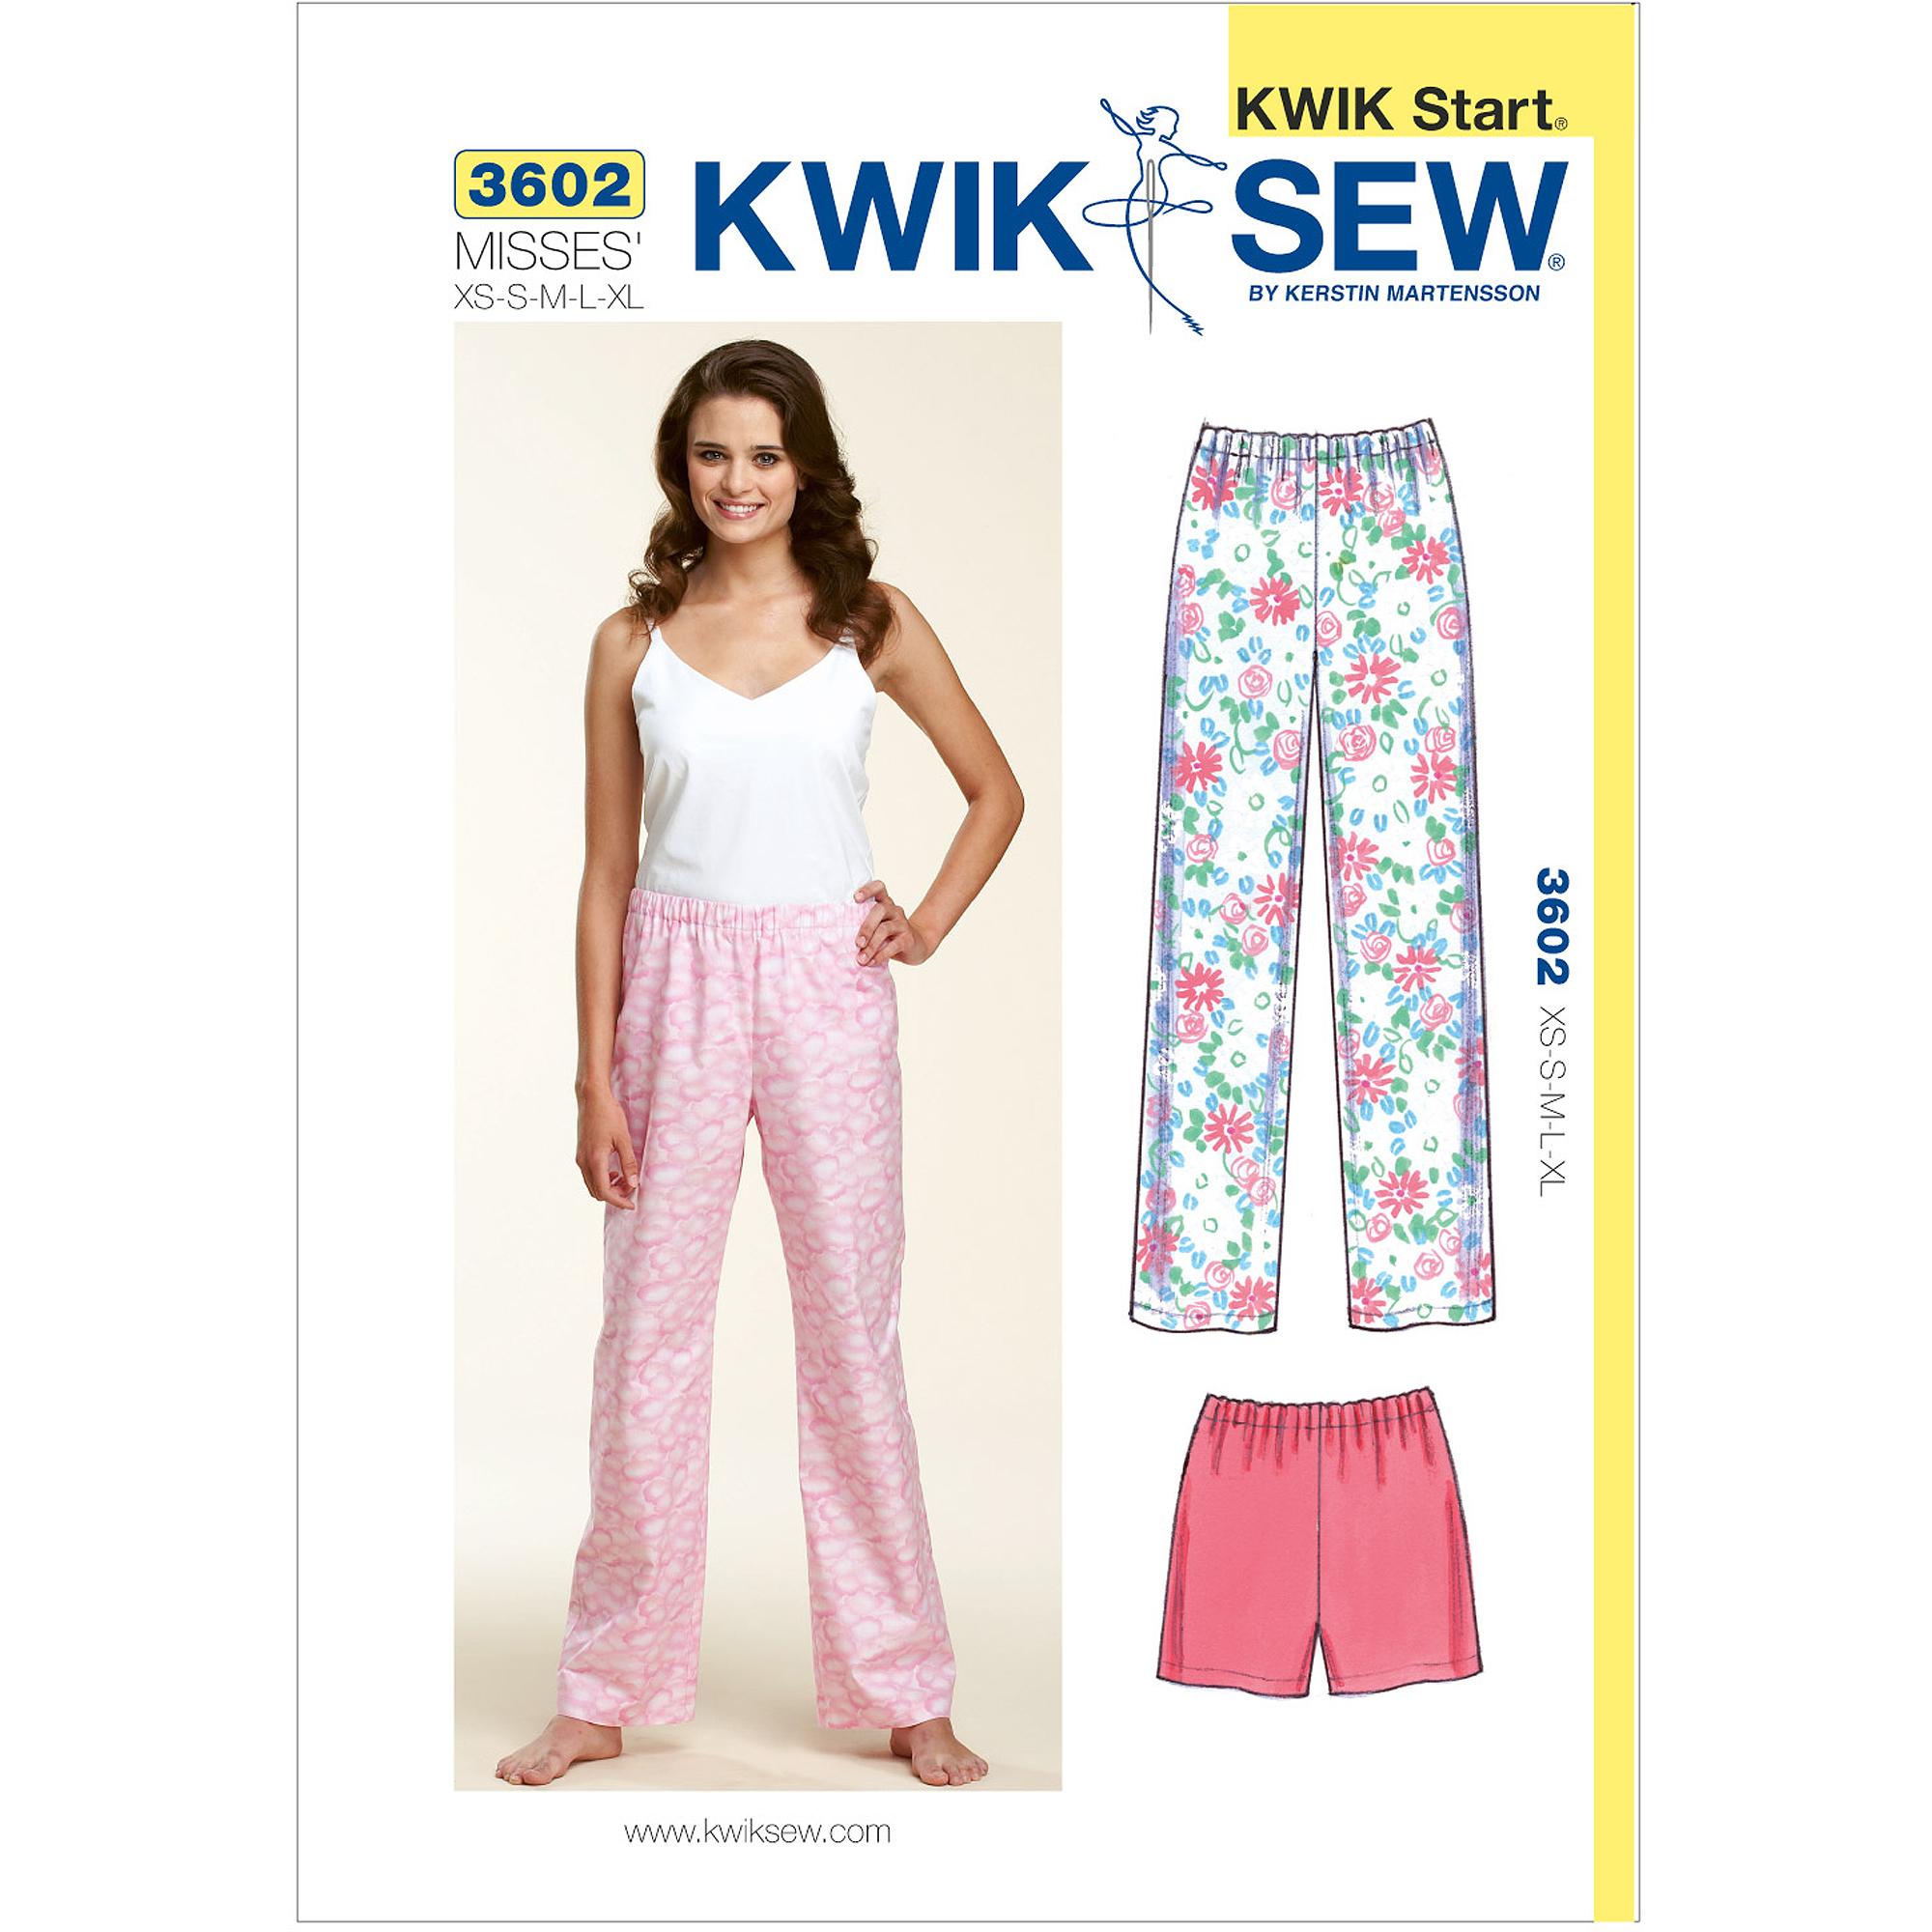 Kwik Sew Sleep Pants and Shorts, (XS, S, M, L, XL)